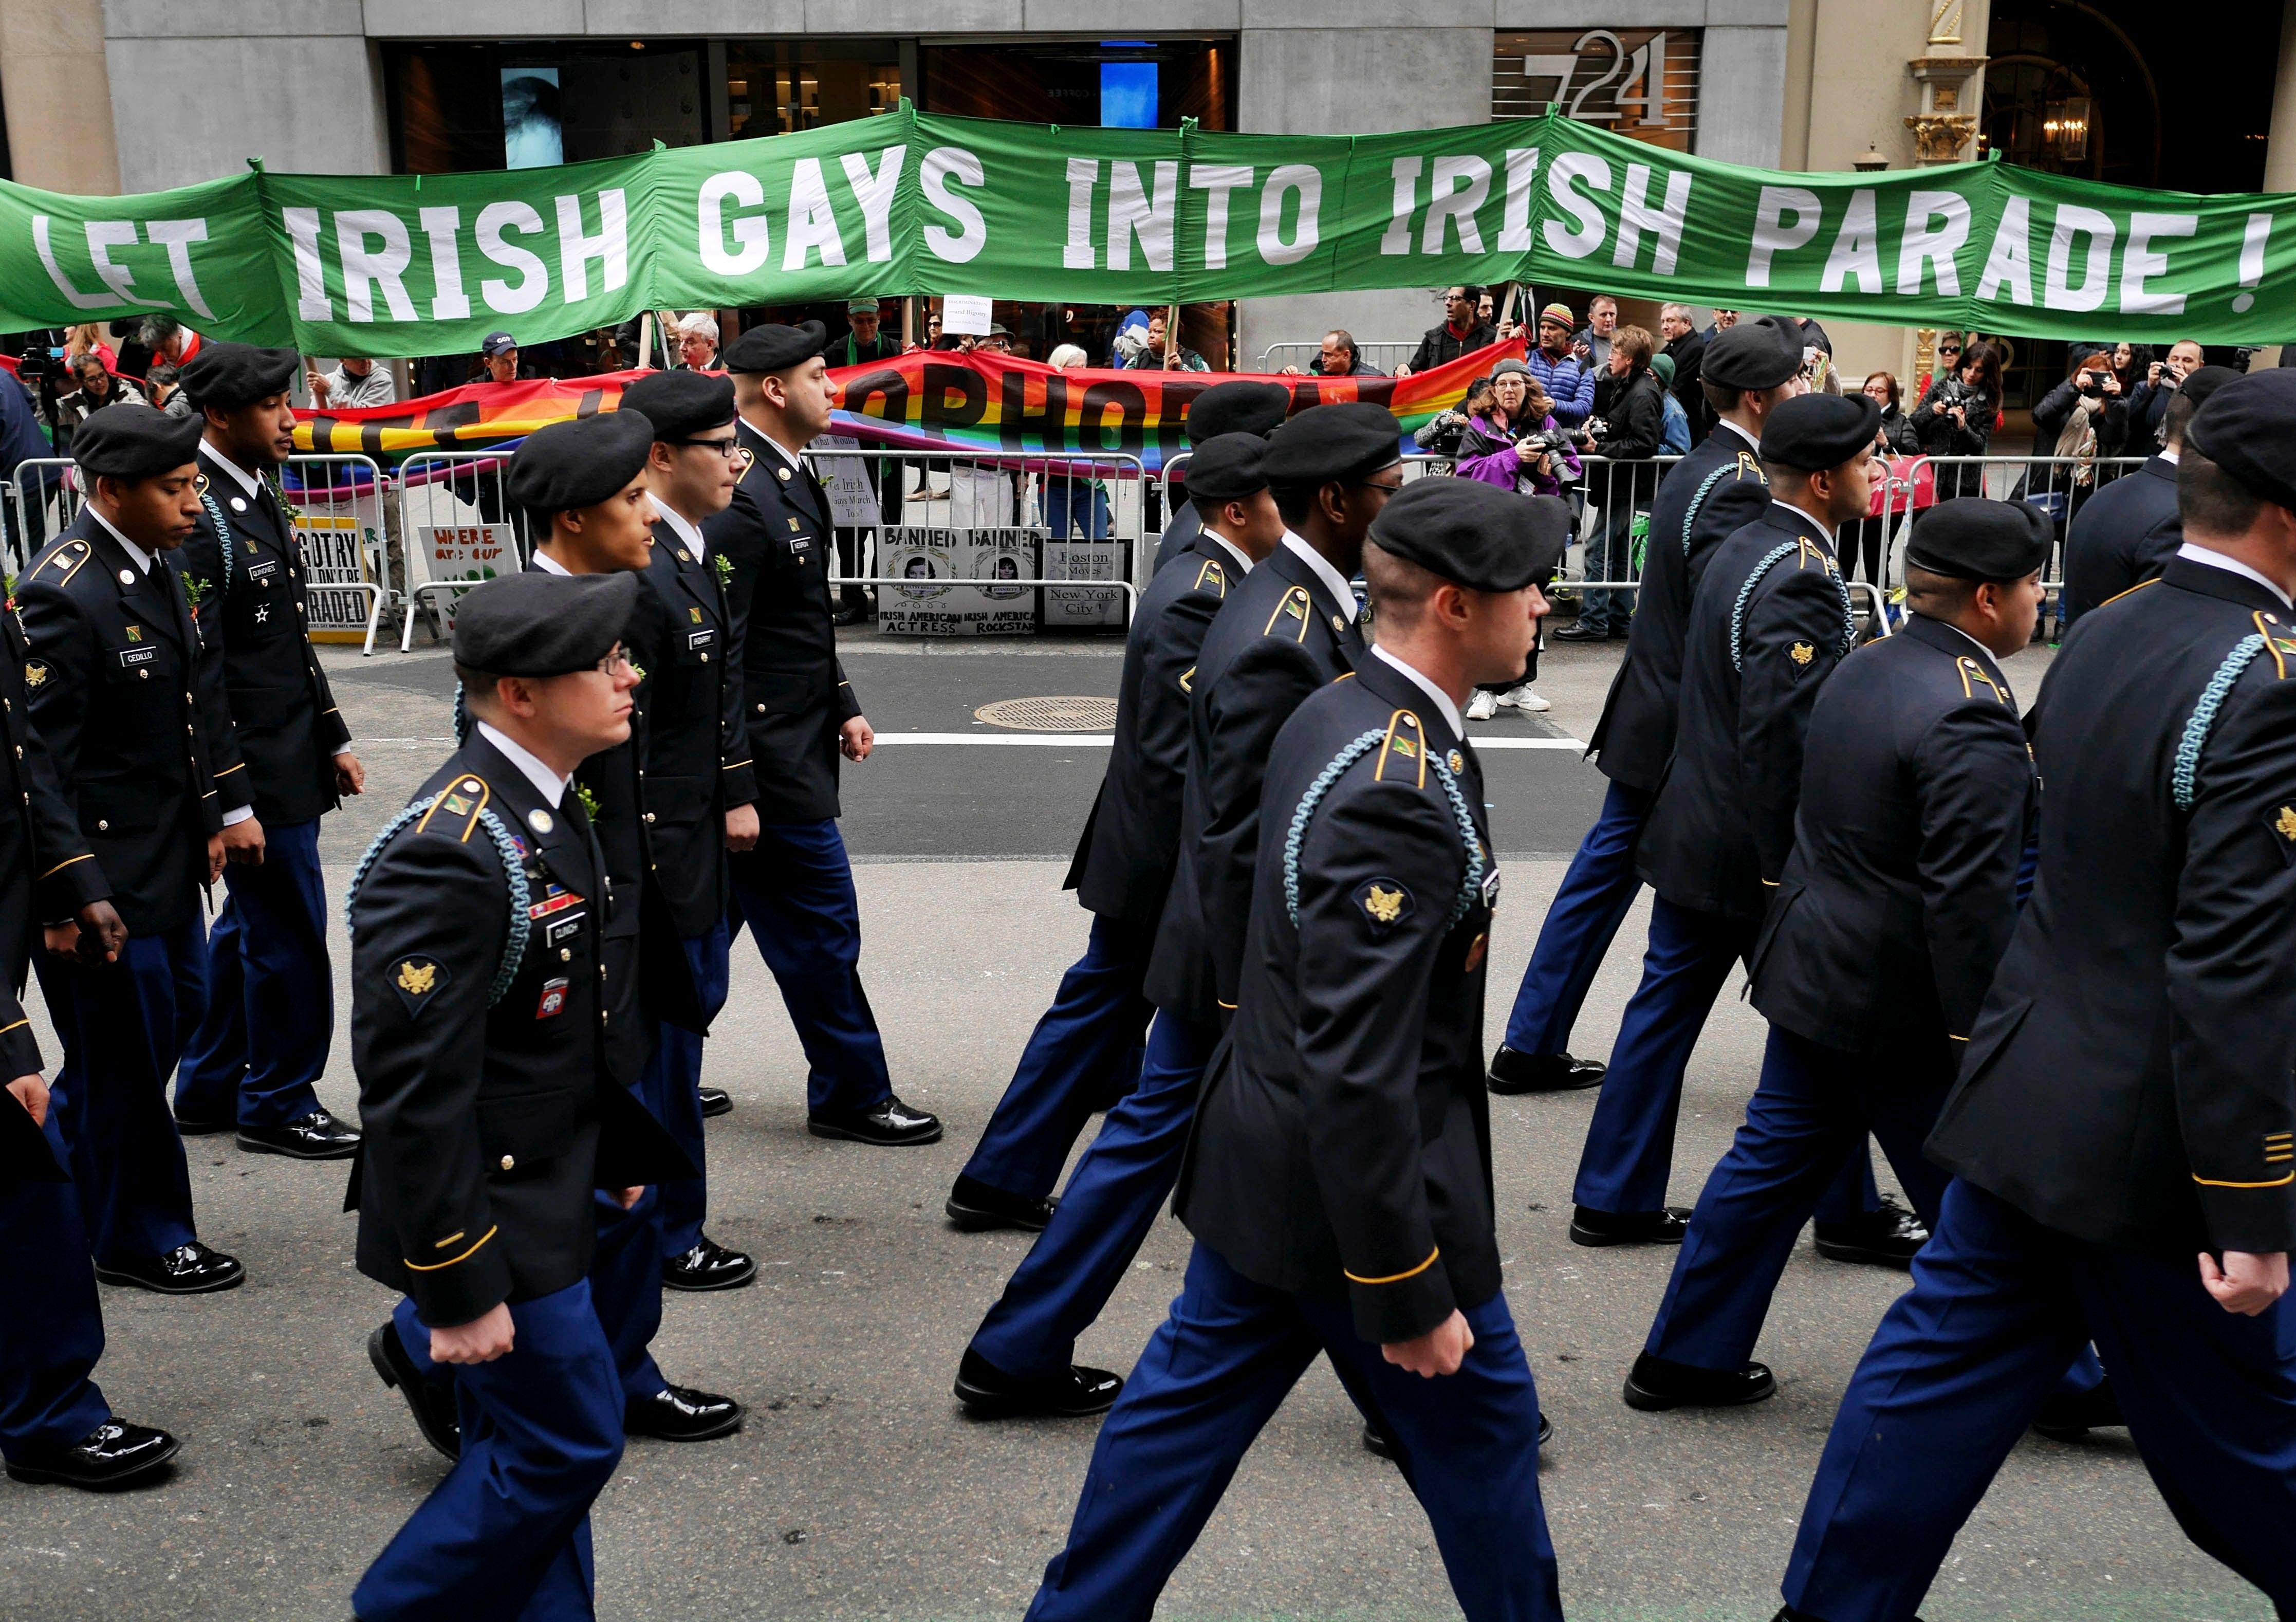 NYC St. Patrick's parade drops gay pride ban - and Ireland can see it on TV